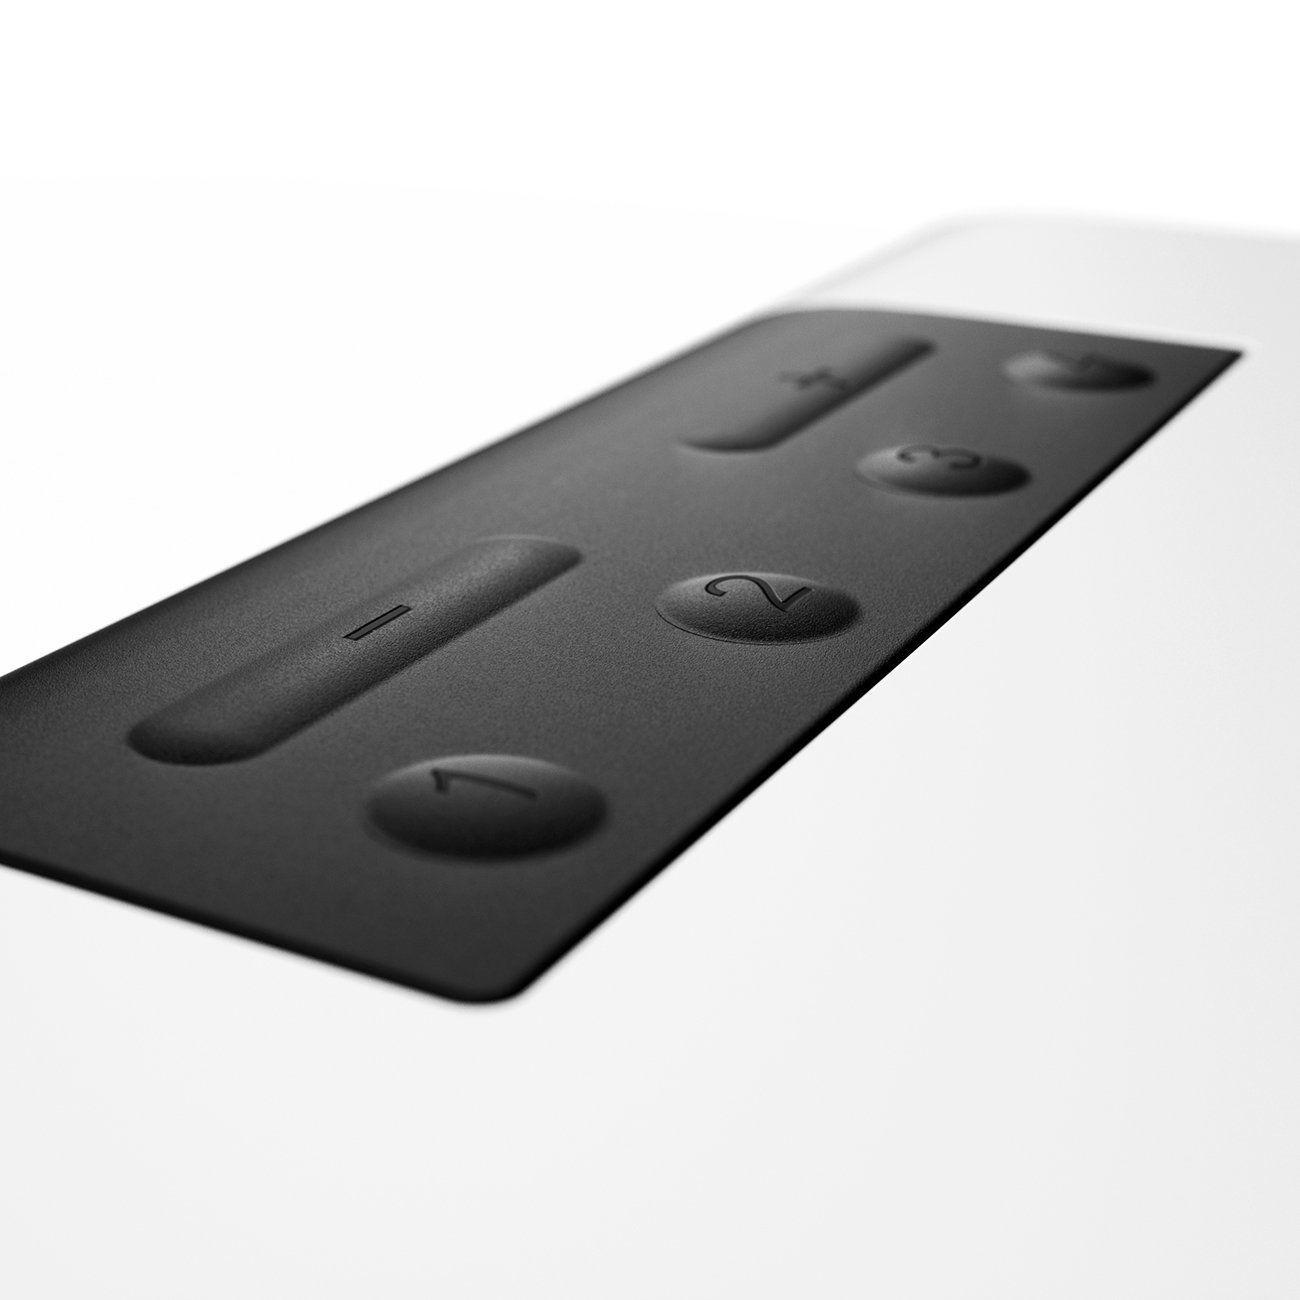 raumfeld one s wlan multiroom lautsprecher tasten hifi. Black Bedroom Furniture Sets. Home Design Ideas